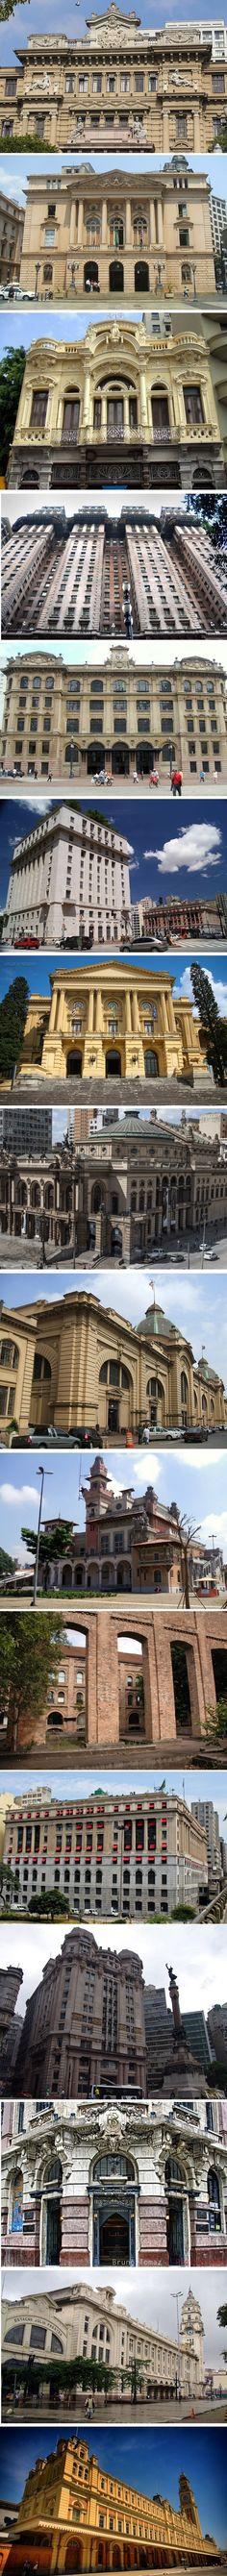 Historic Buildings of St. Paul, Brazil / Prédios Históricos de São Paulo, Brasil